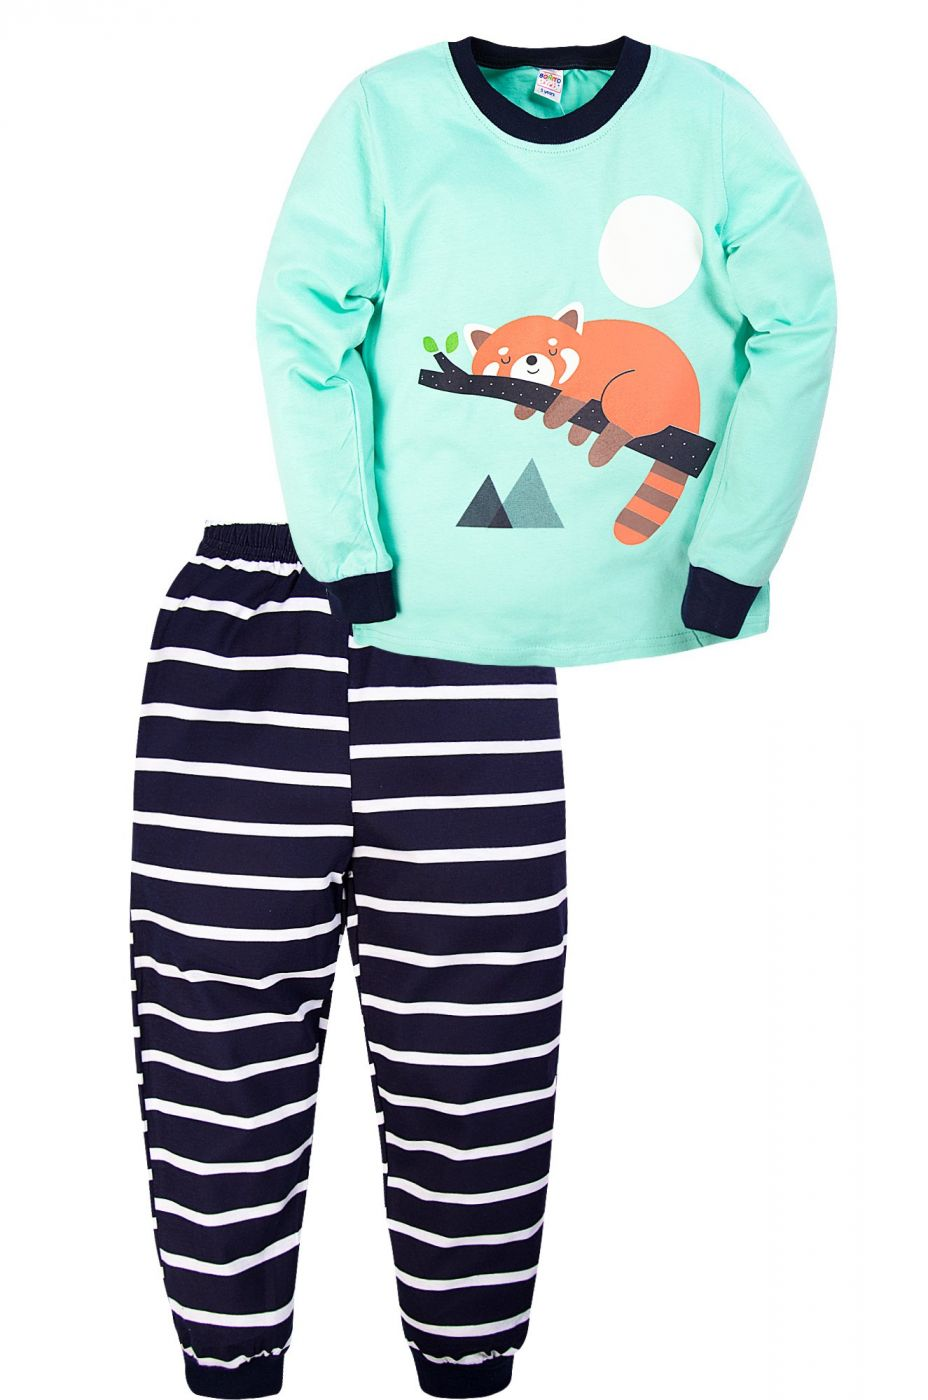 Пижама для мальчика Bonito бирюзовая с енотом